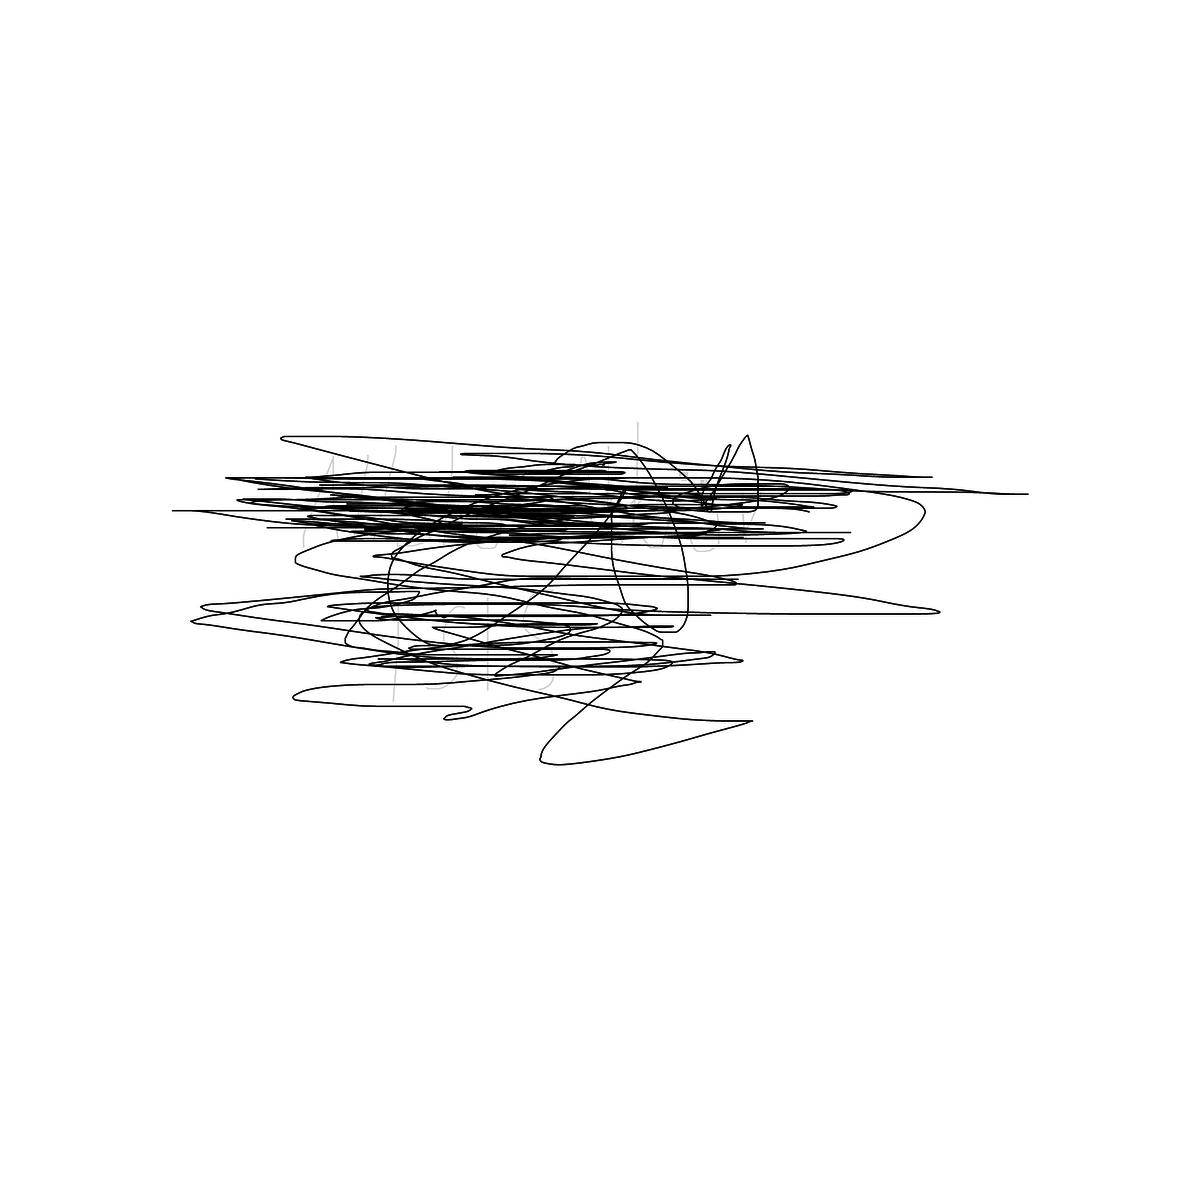 BAAAM drawing#22971 lat:52.8027610778808600lng: -62.5781173706054700